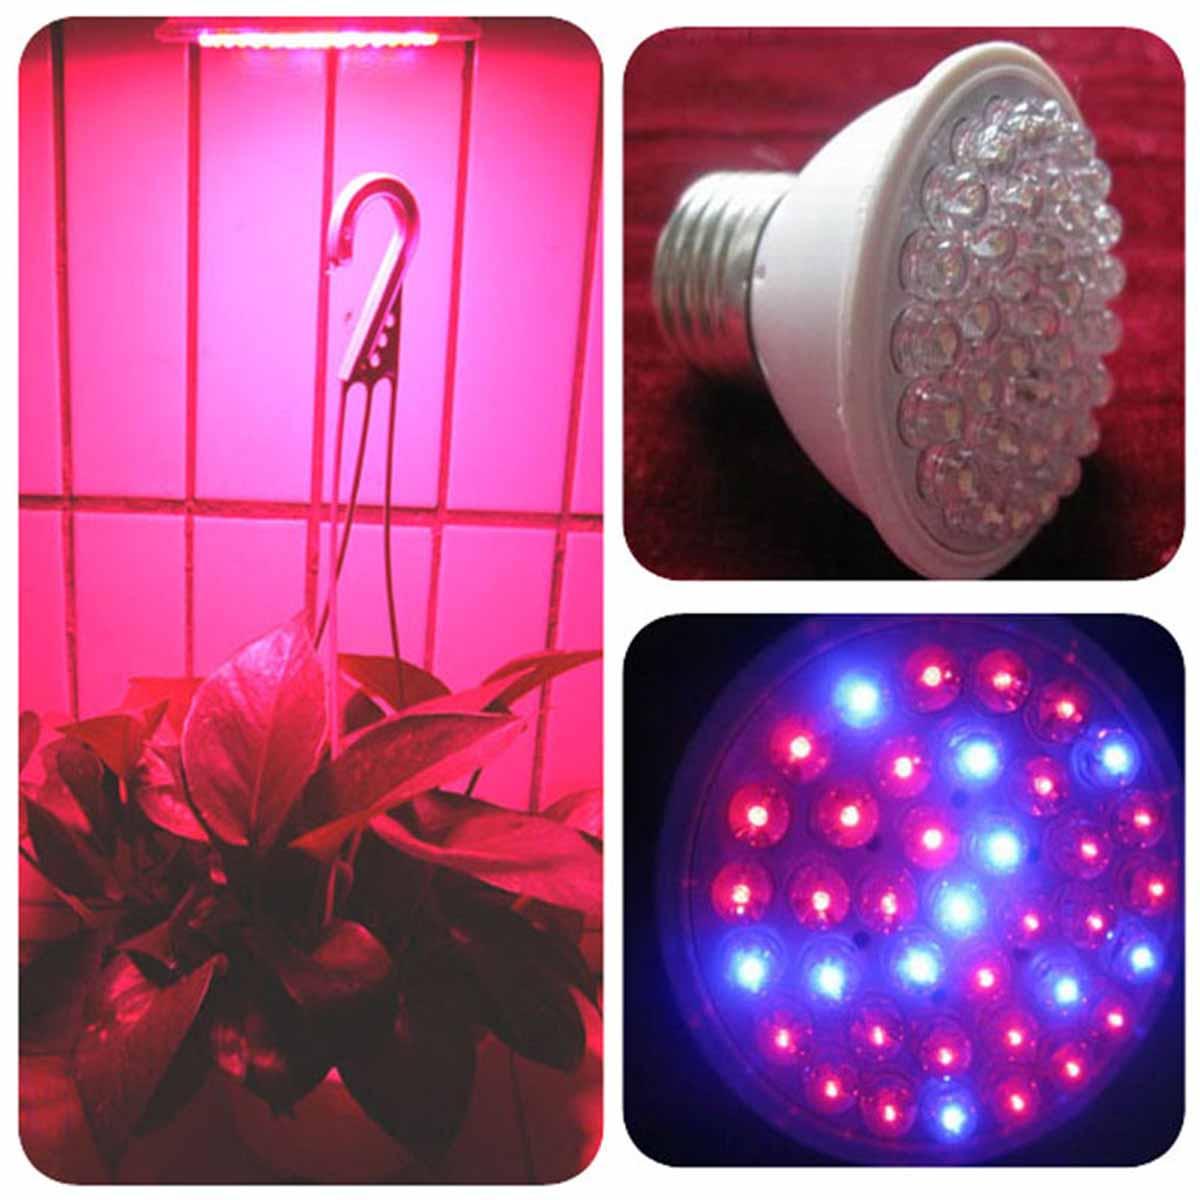 Plant Grow LED Light Bulb Hydroponic Lamp 38/60/80 LEDs 110V AC Plant Growing Lamps Bulb Garden Flowers Plants Help Growing Tool